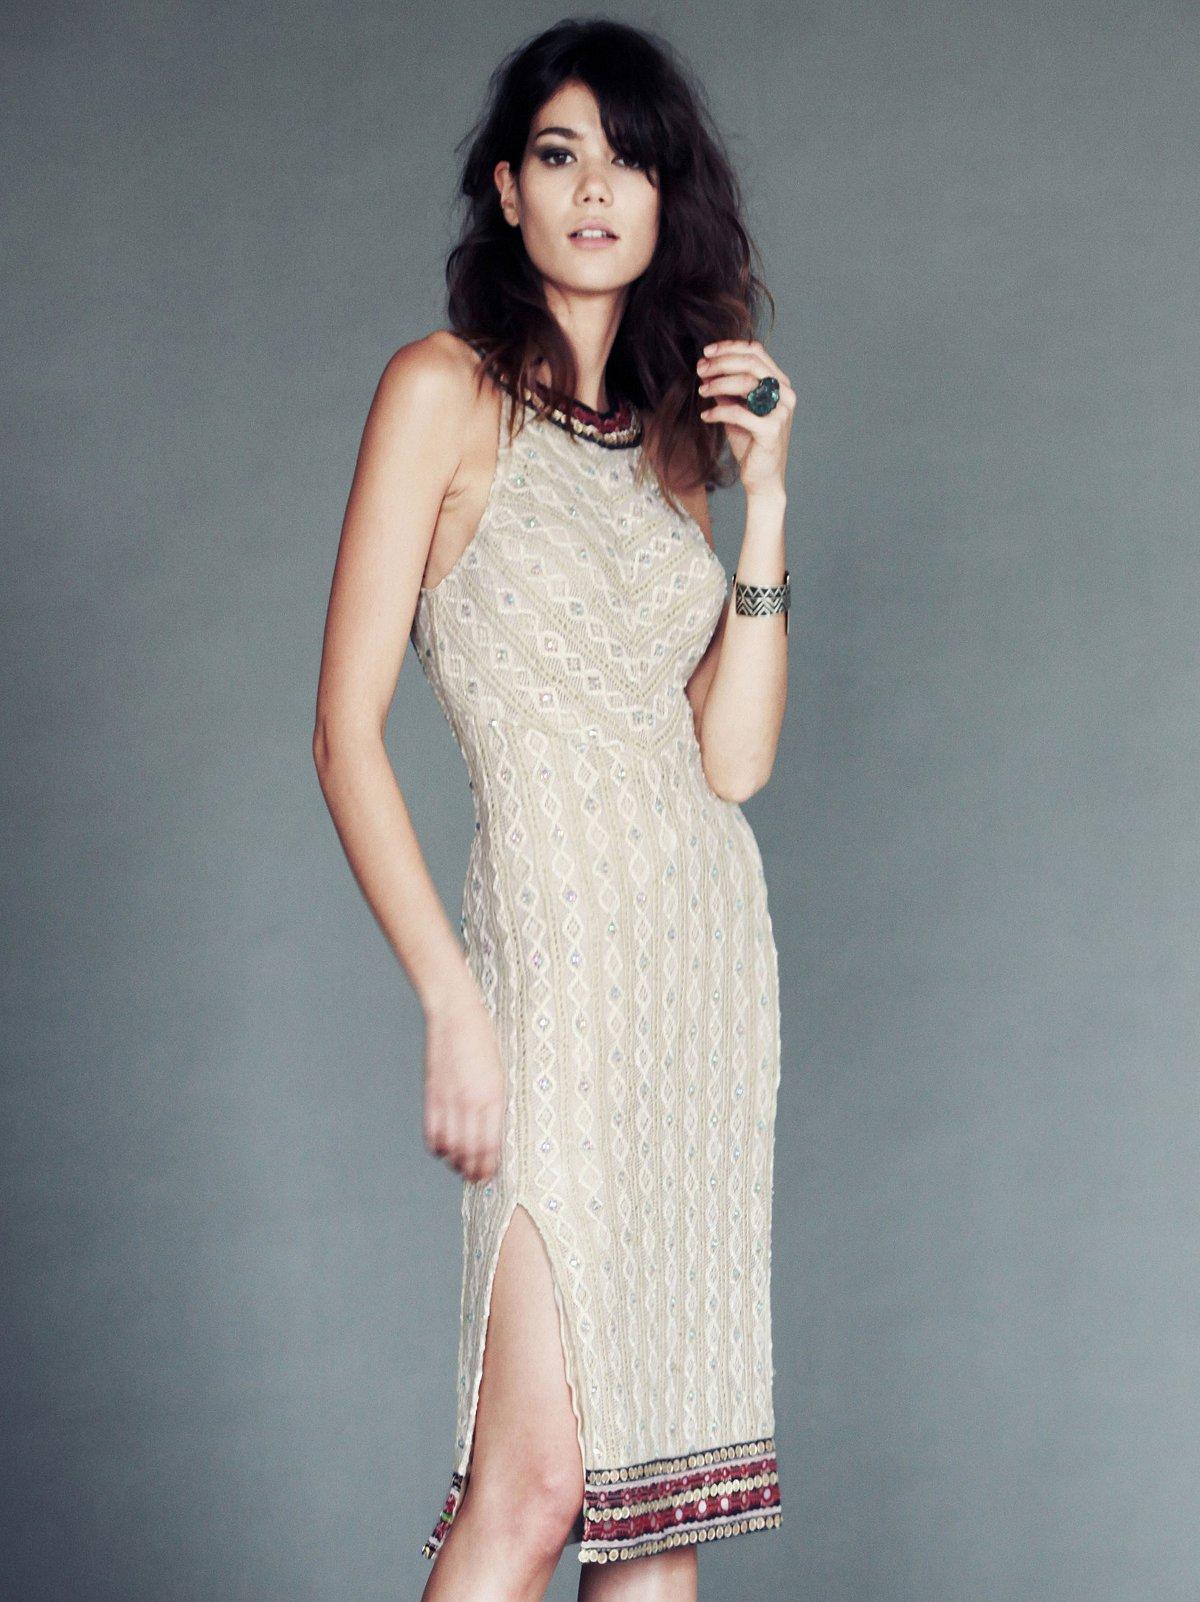 Kristal's Limited Edition Dress